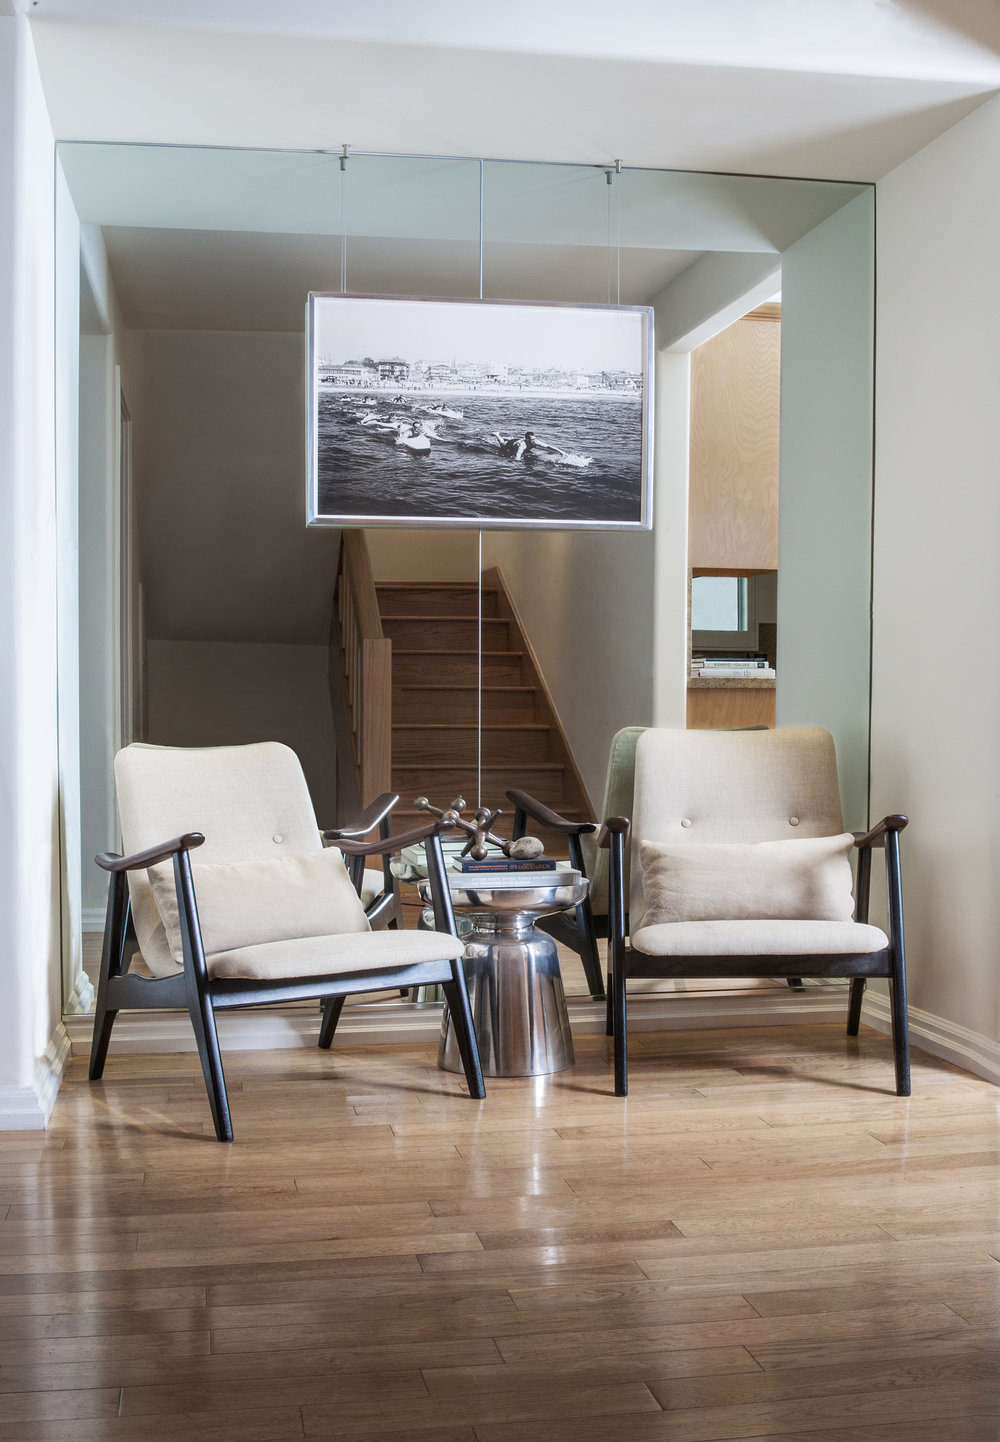 Vein Design- Marina Entry Chairs for Nicole.jpg